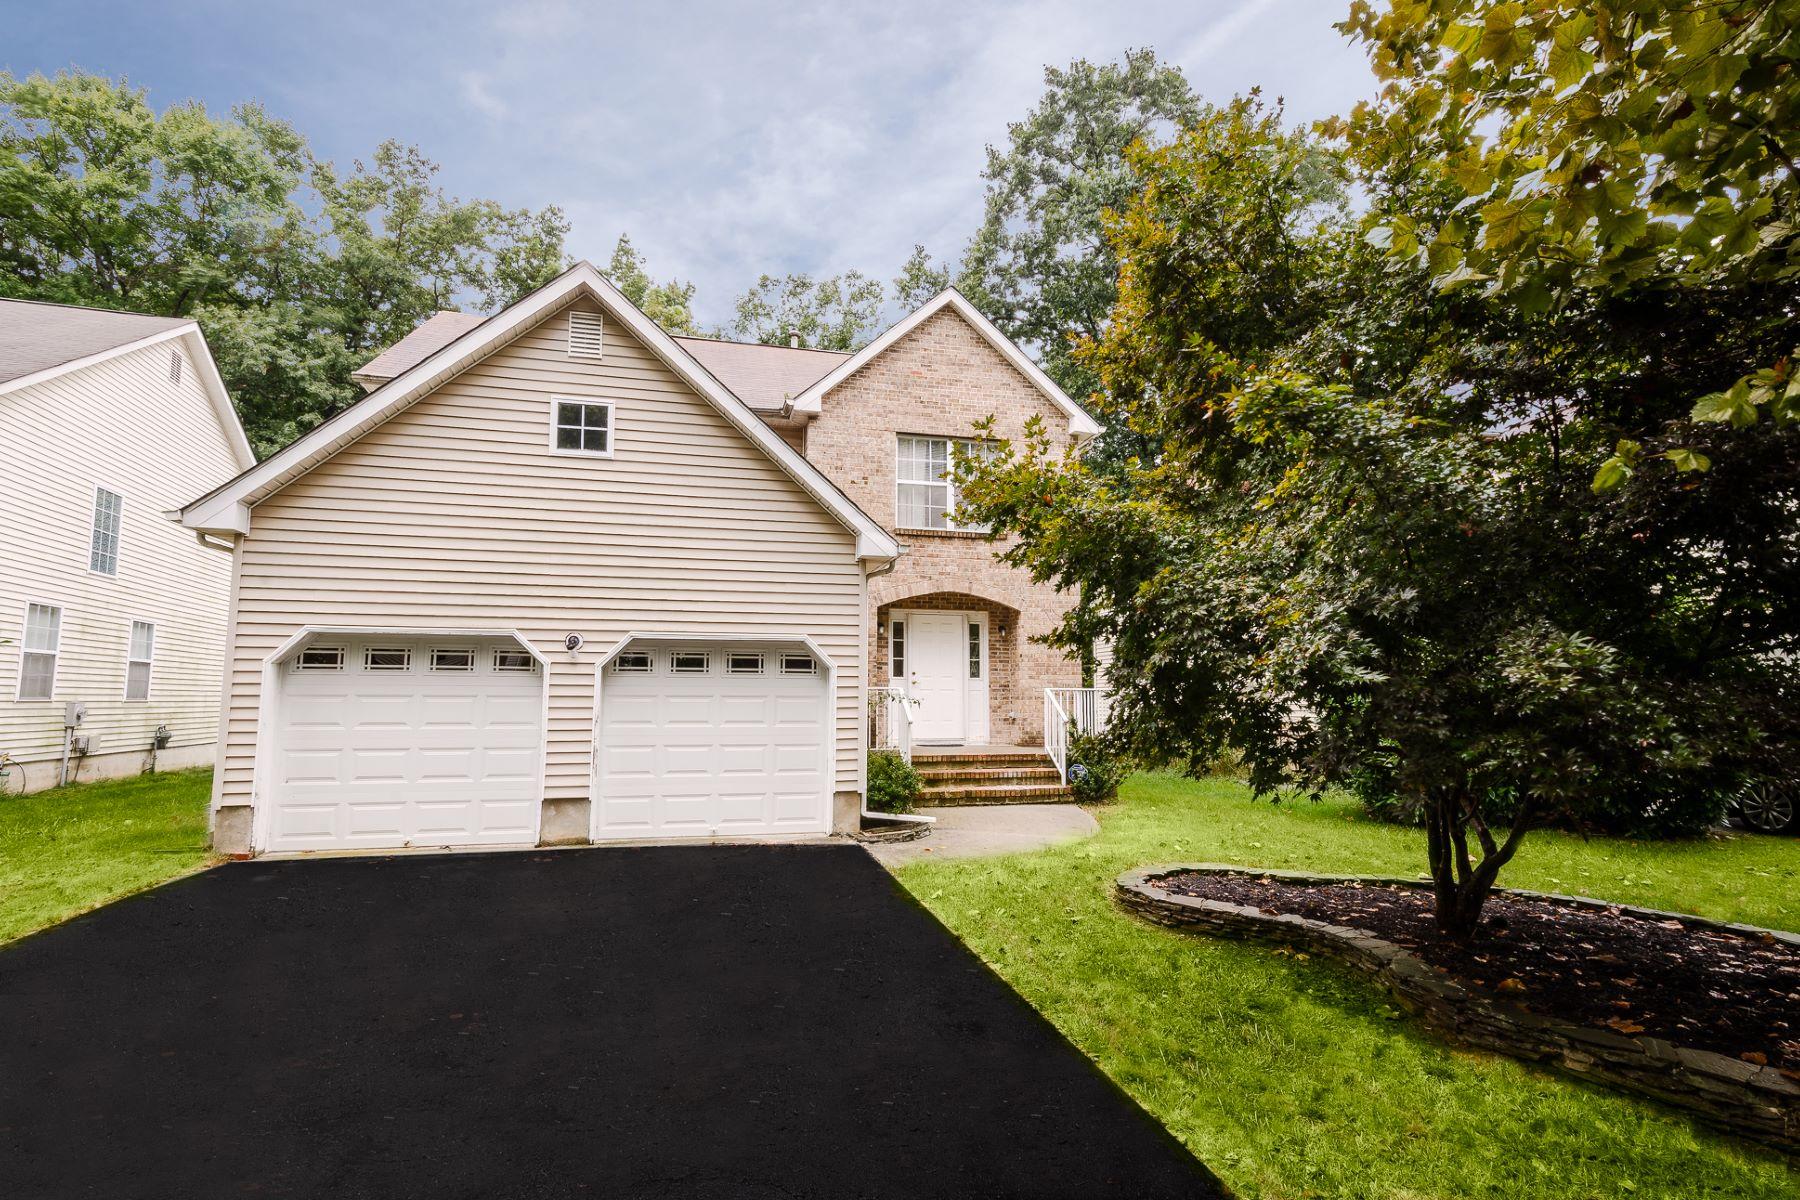 Single Family Homes για την Πώληση στο Elegant living. Convenient location. 60 Canal View Drive, Lawrence Township, Νιου Τζερσεϋ 08648 Ηνωμένες Πολιτείες